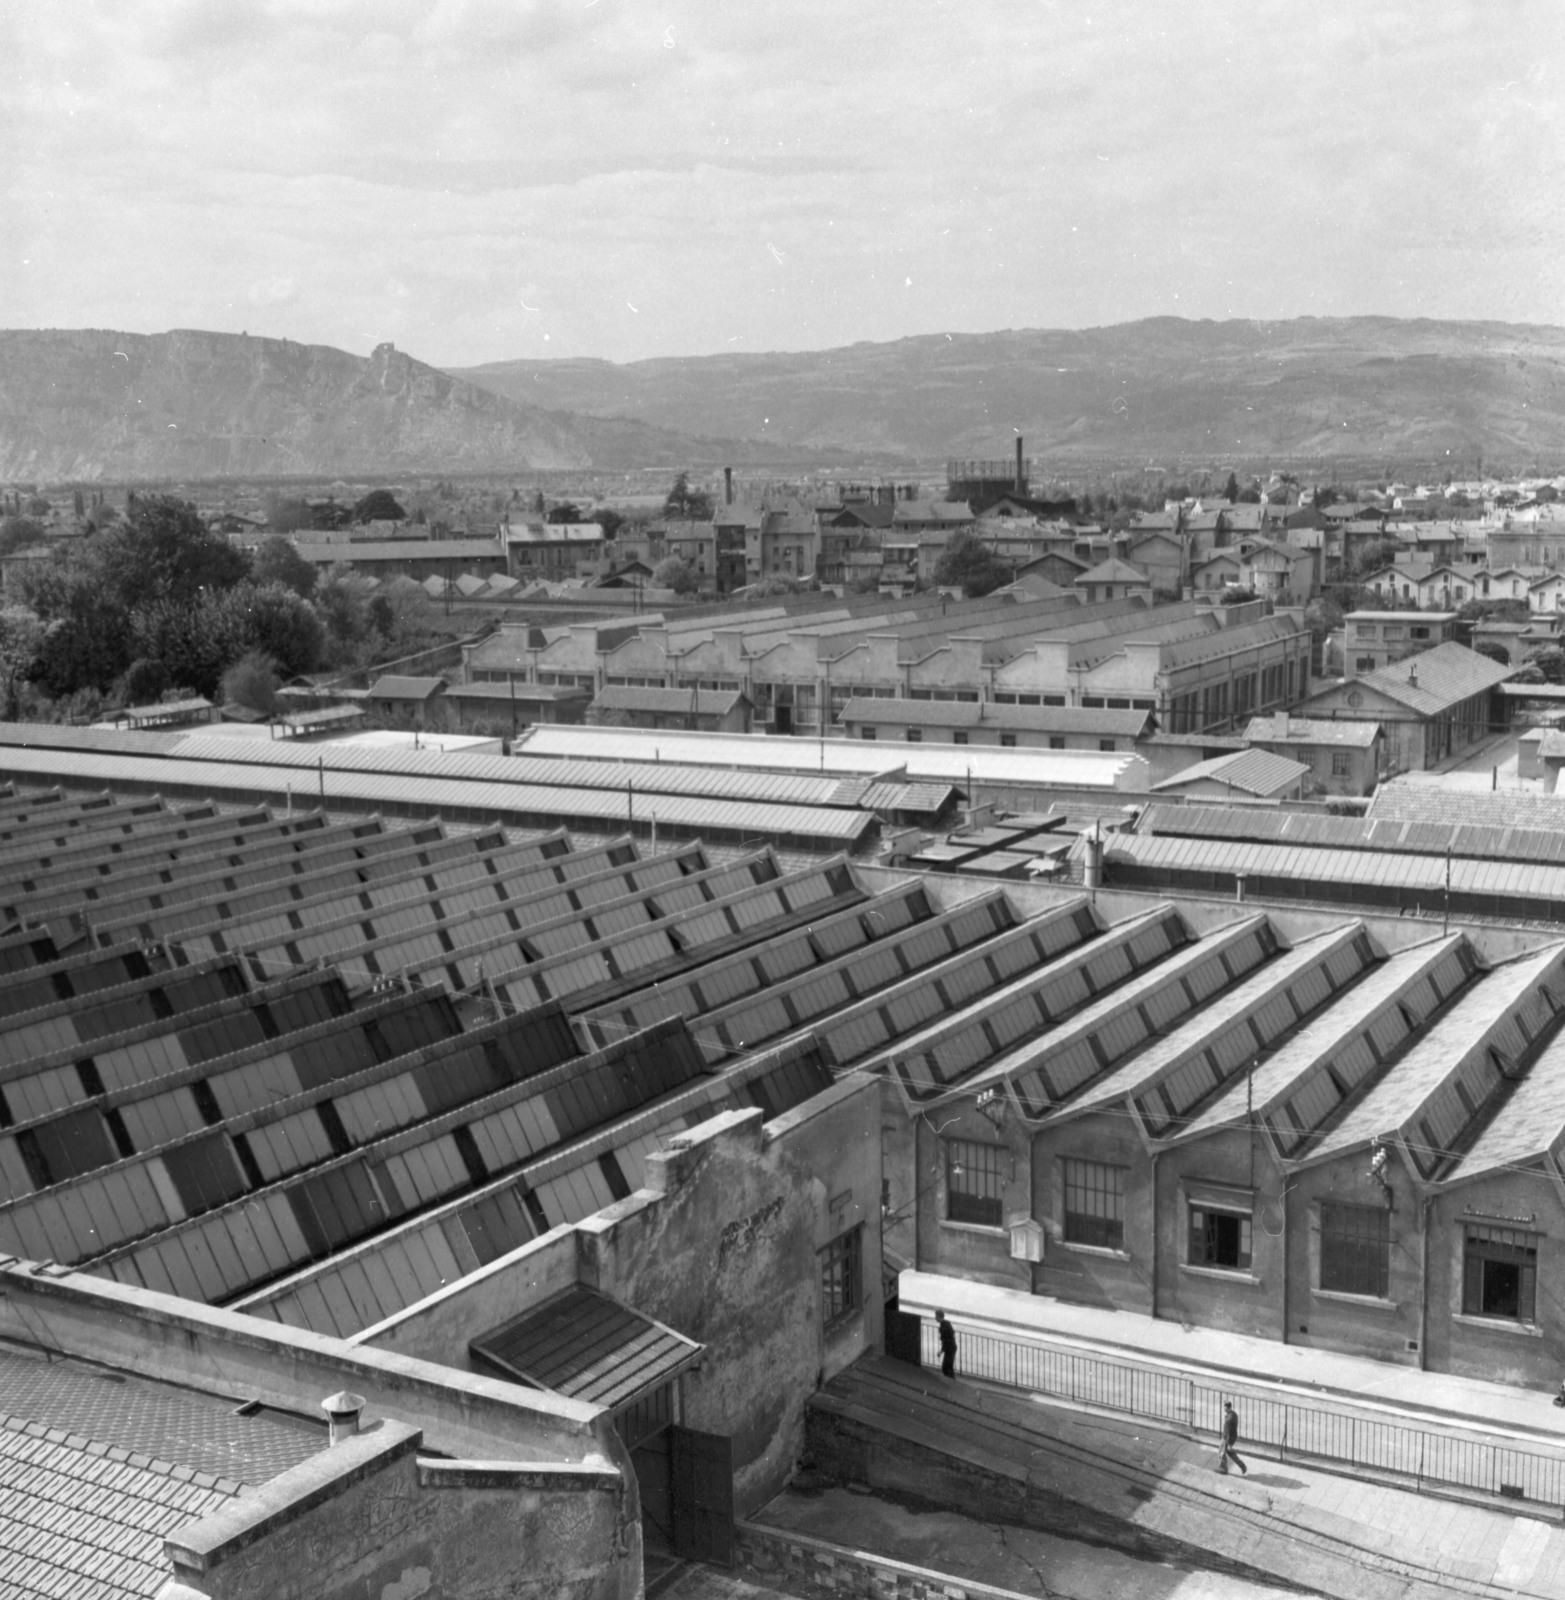 [Steel Replaces Copper in Ammunition - Cartoucherie National de Valence, Rhone River]